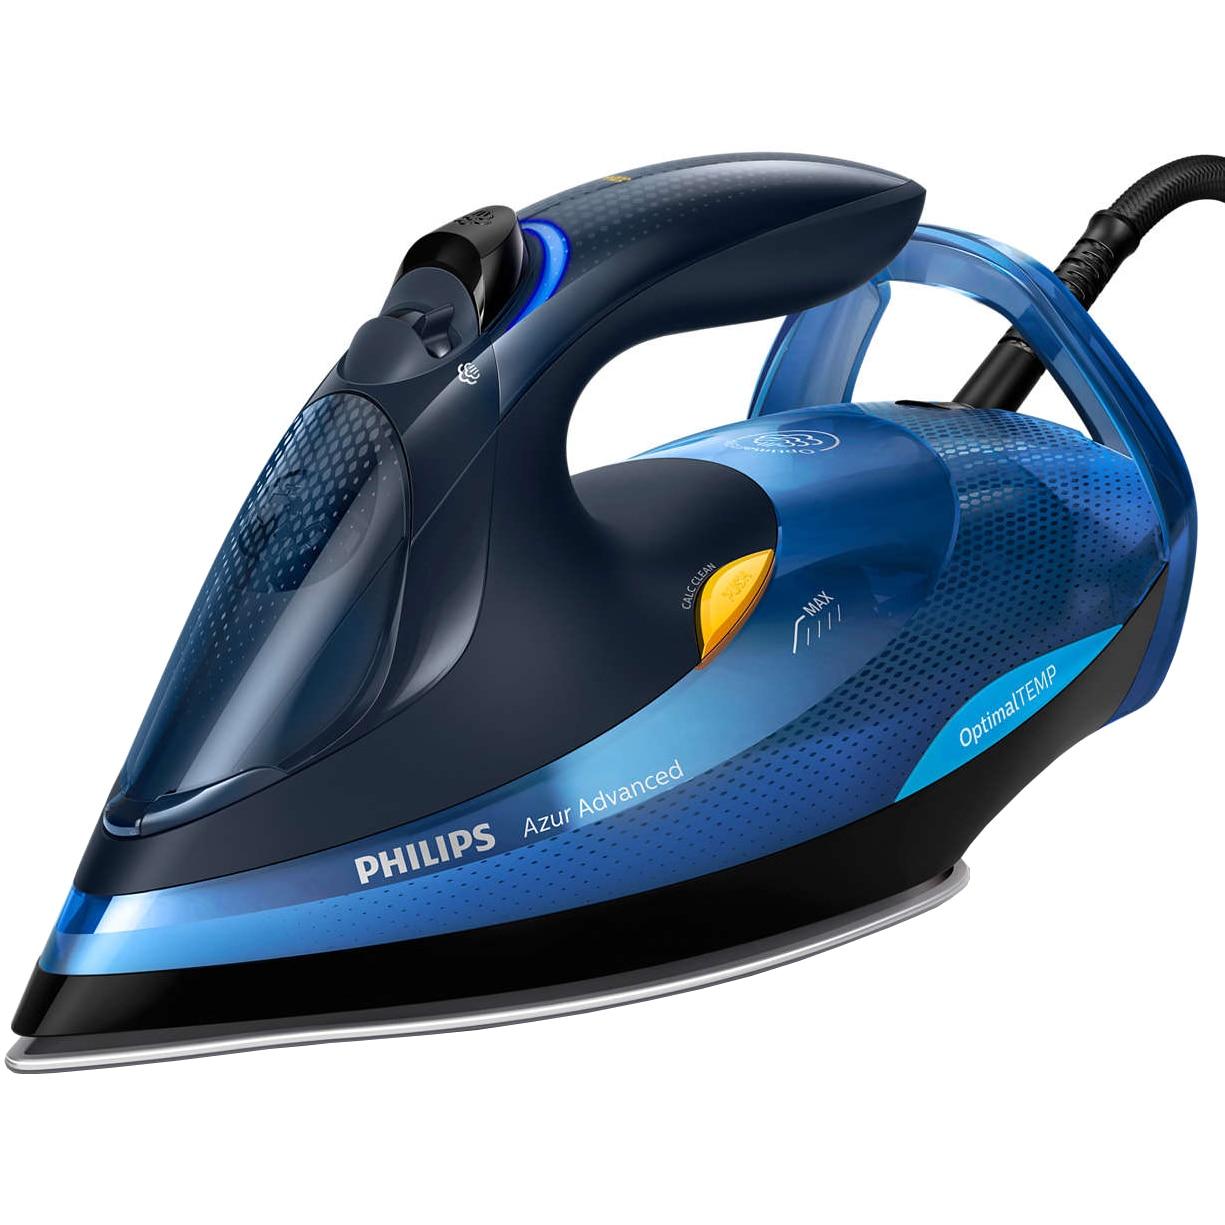 Fotografie Fier de calcat Philips Azur Advanced GC4932/20, 2600 W, Talpa SteamGlide Plus, Tehnologie OptimalTEMP, Curatare automata, Negru/Albastru